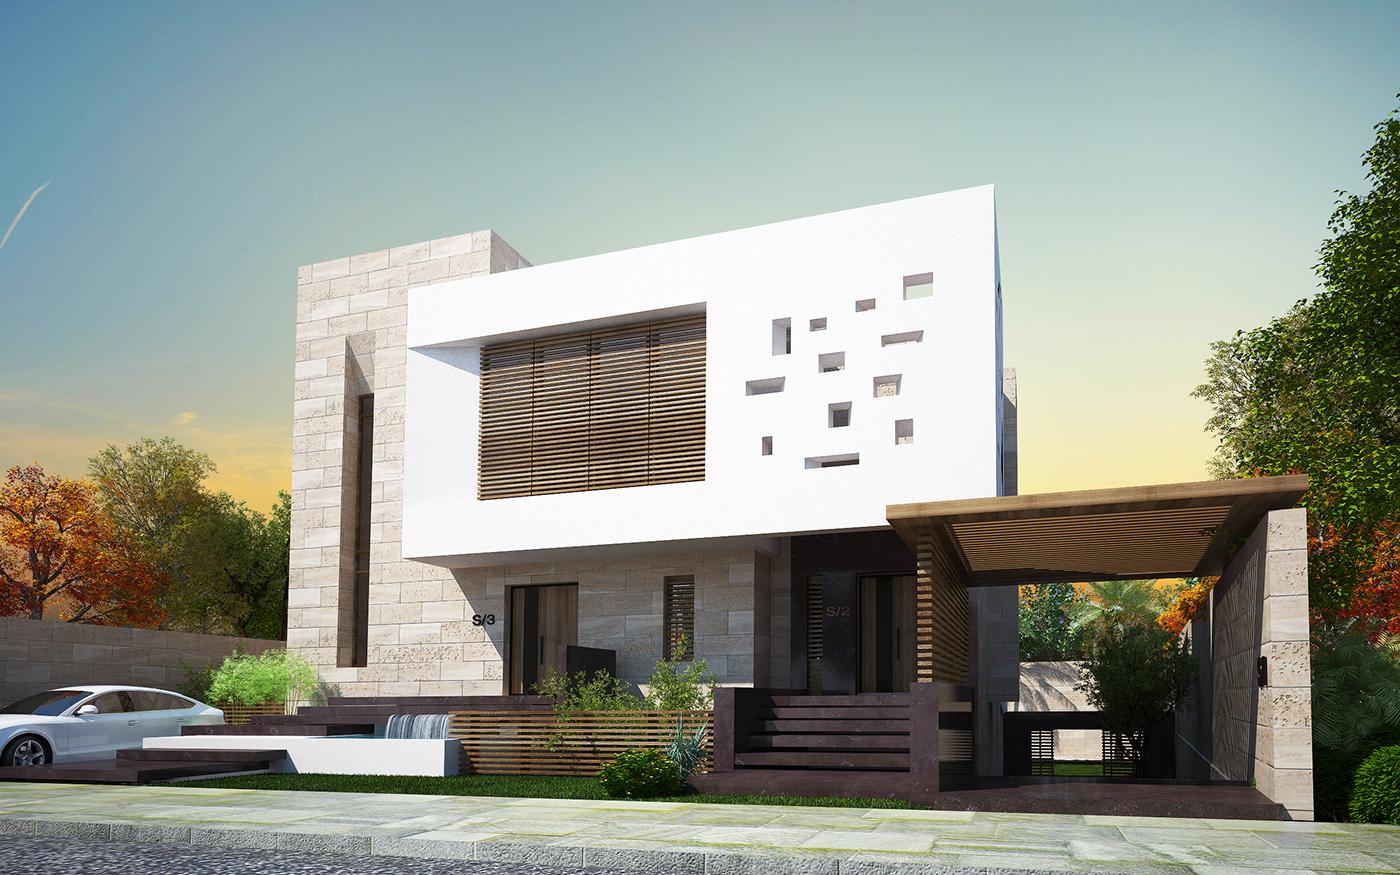 688 960 arq for Viviendas modernas fachadas